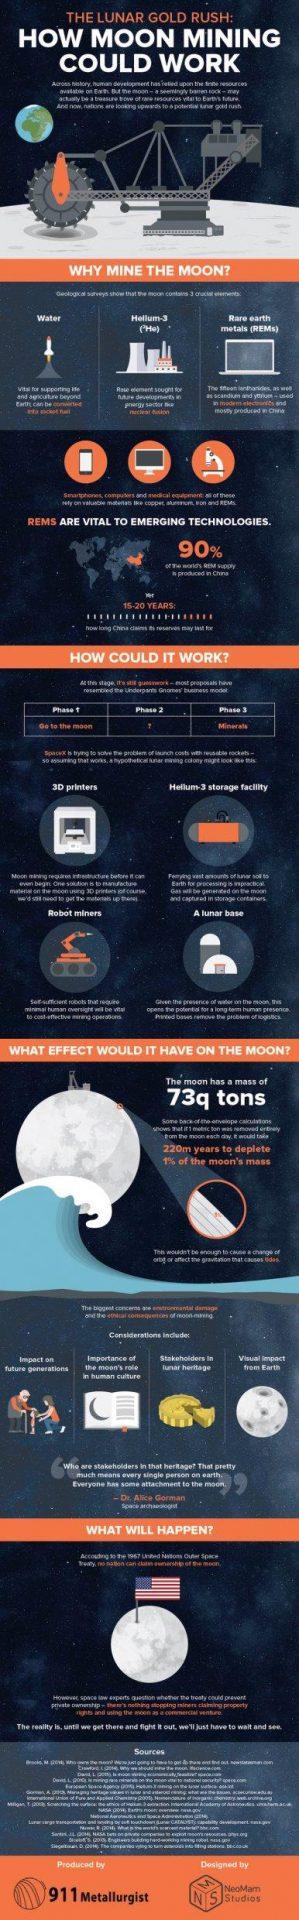 (Image: NASA/JPL/911Metallurgist/NeoMam Studios)